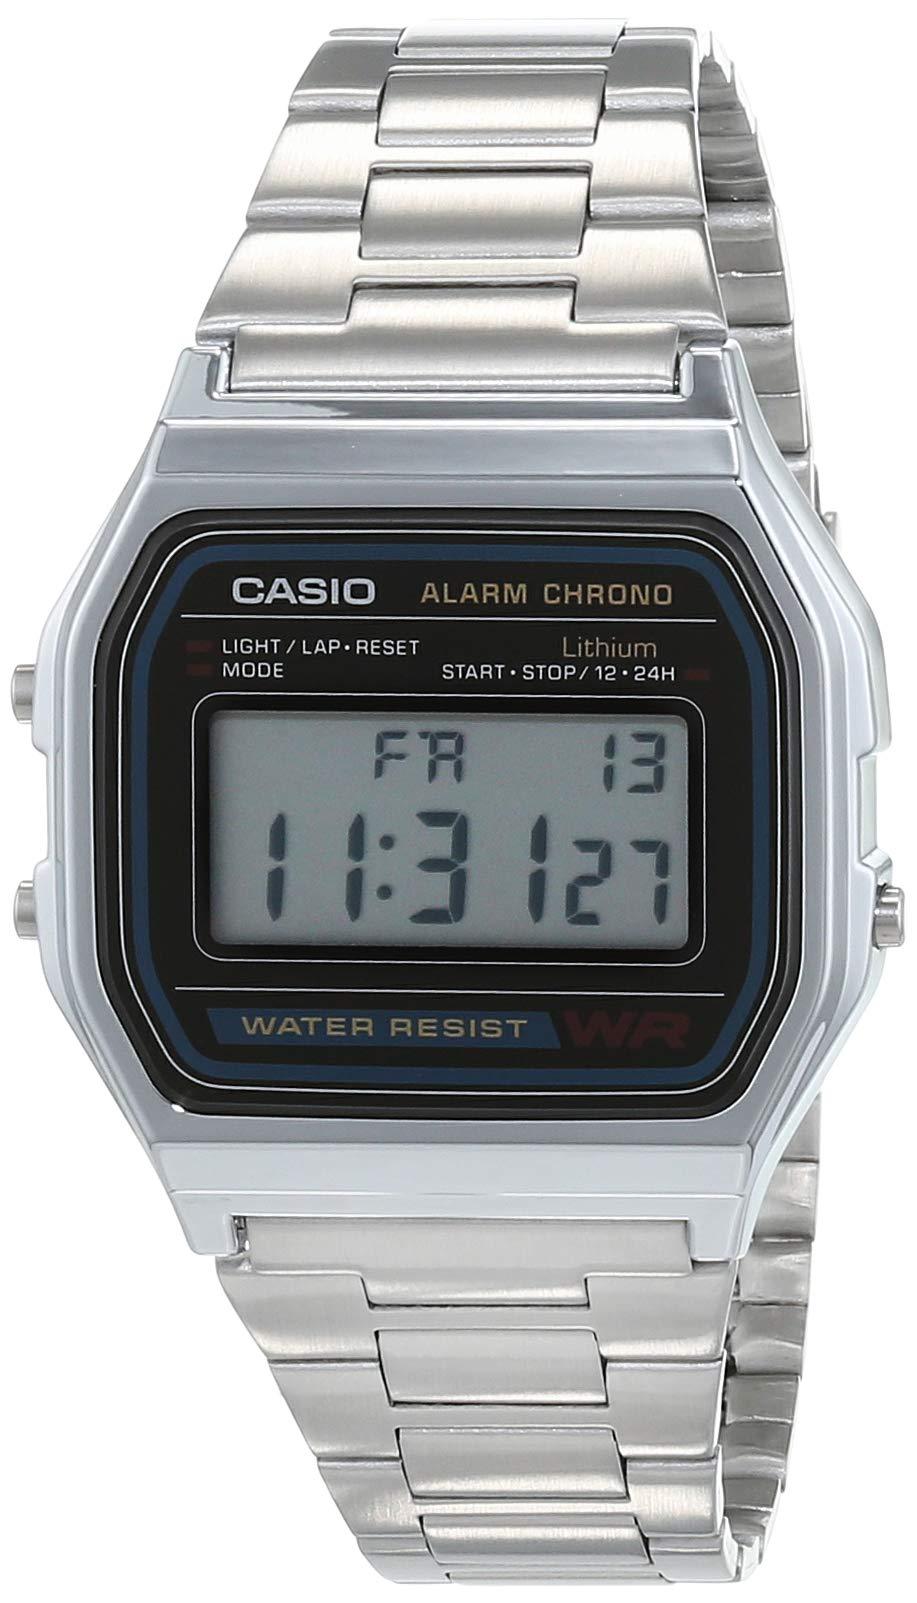 Casio A158WA - Reloj unisexo, correa de acero inoxidable color plateado product image